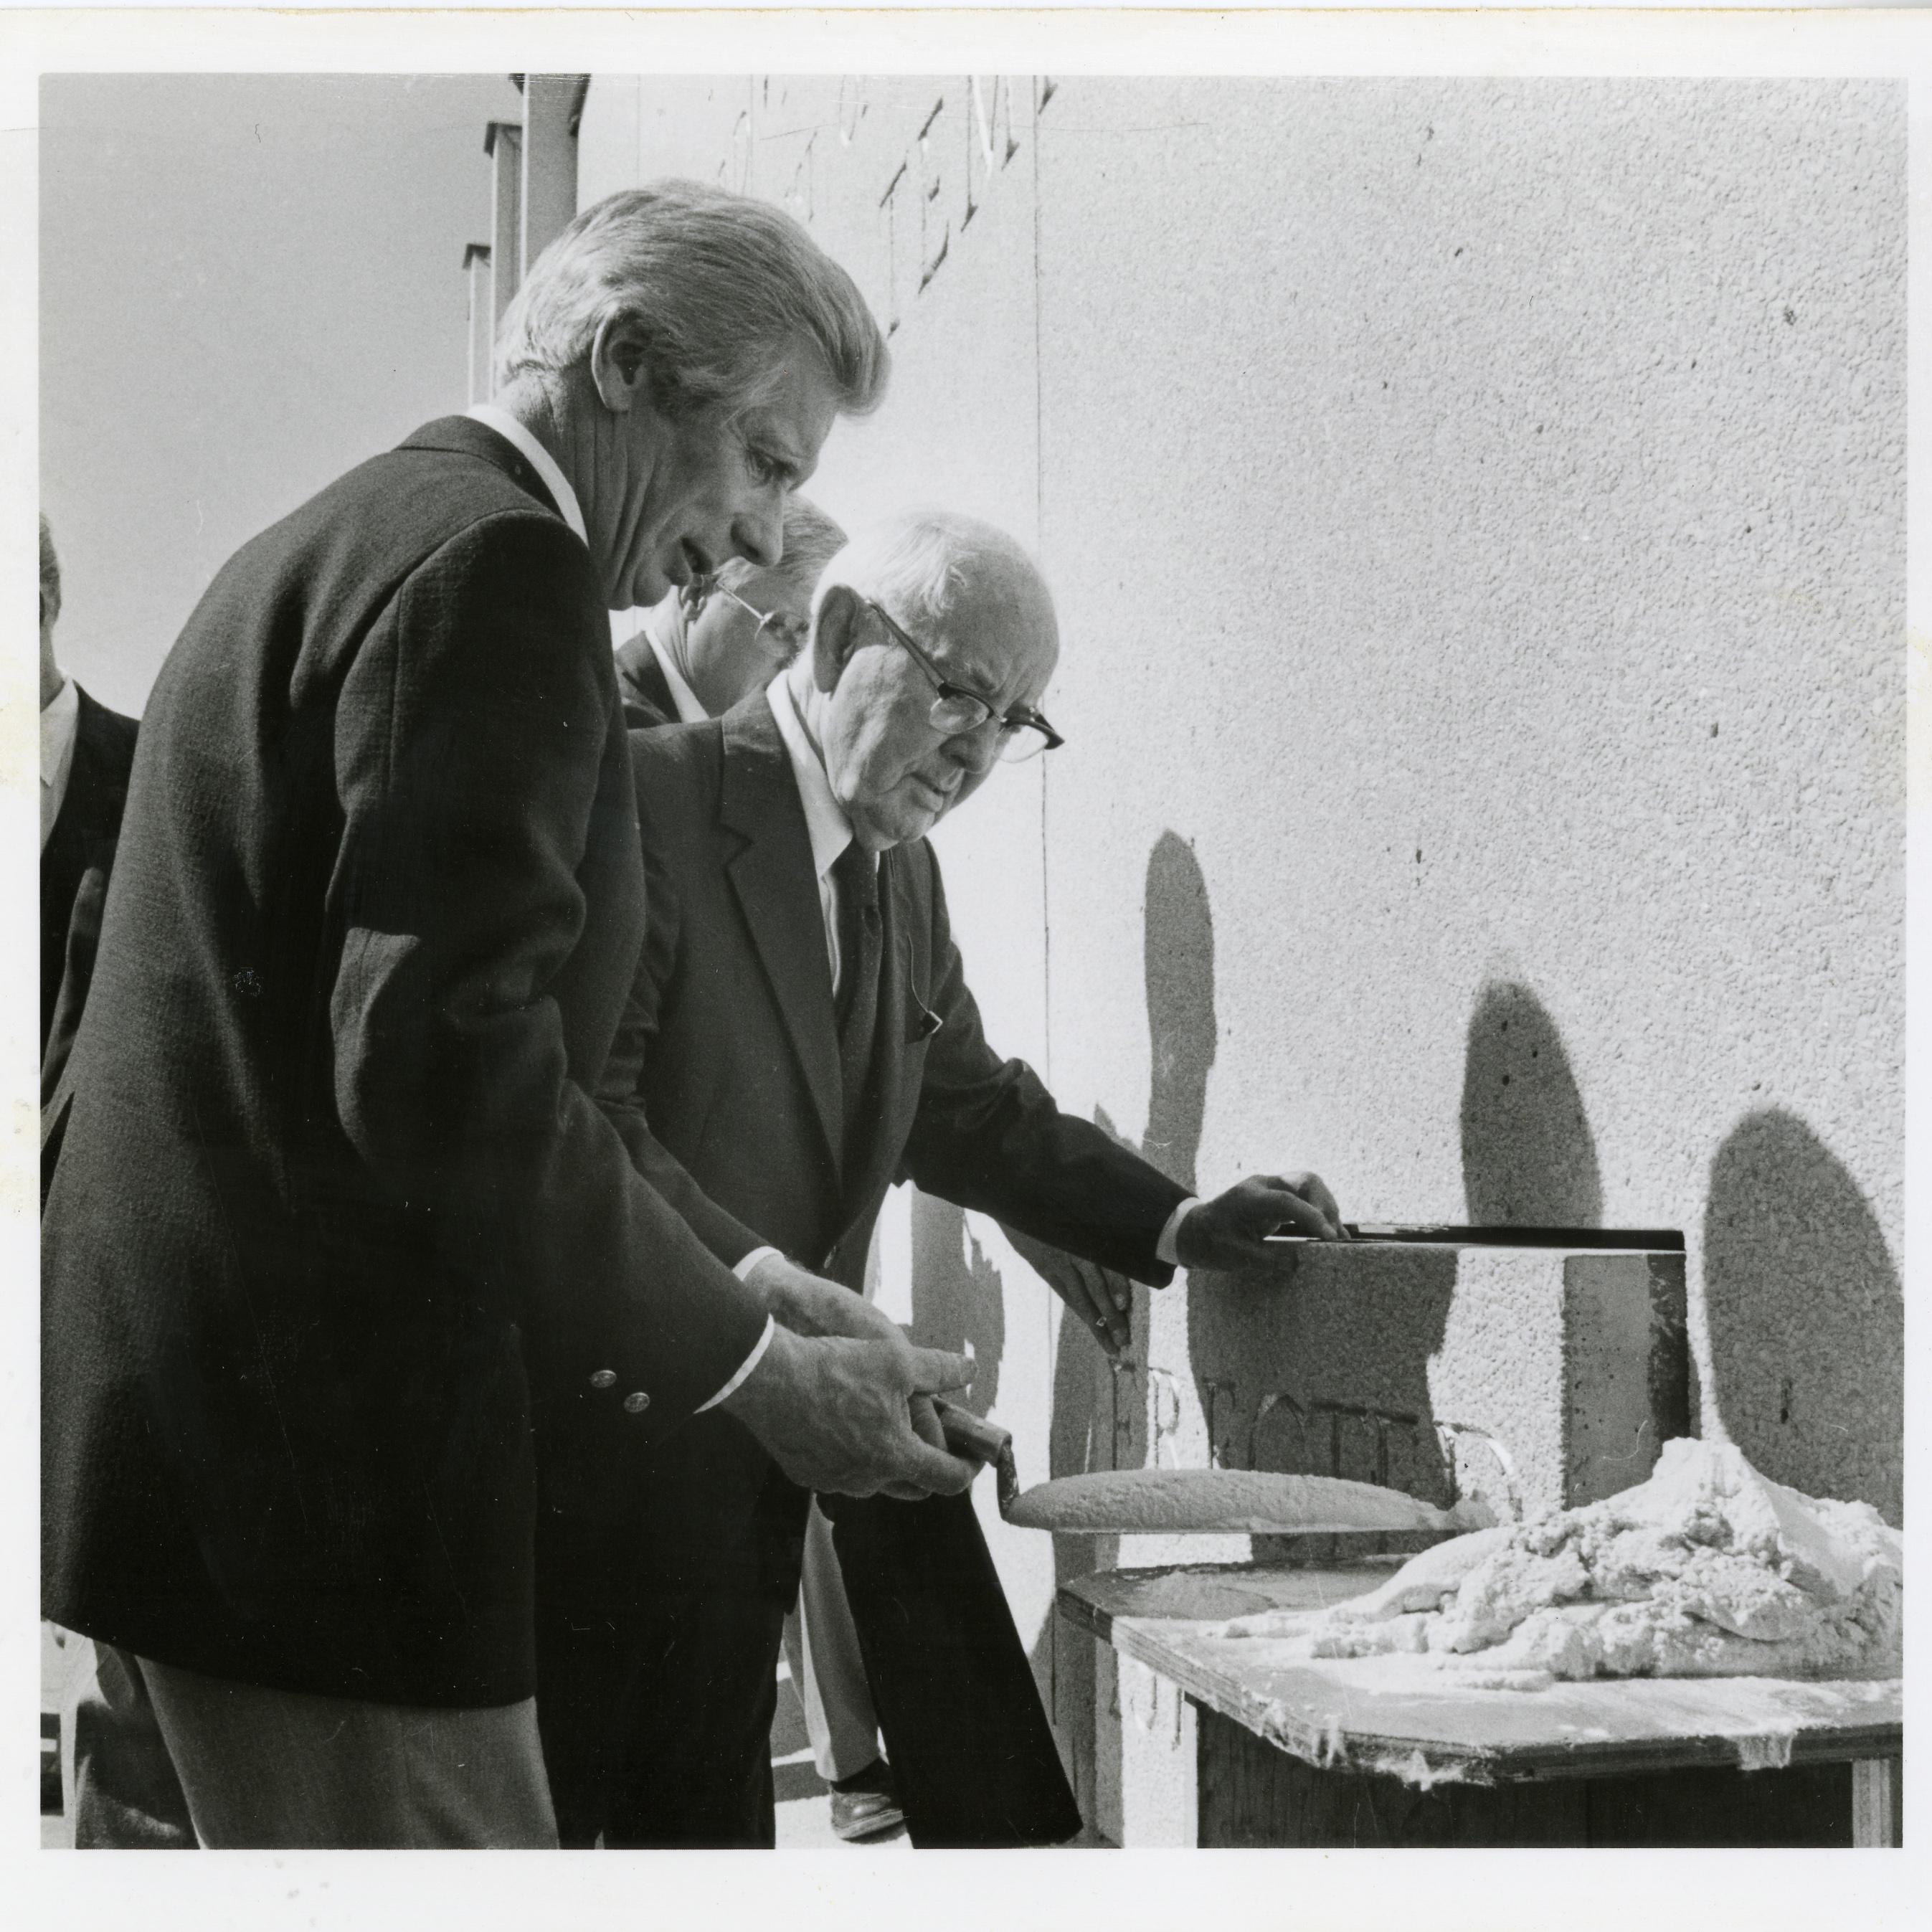 Church President Spencer W. Kimball, seals the cornerstone prior to dedicating the Jordan River Utah Temple in 1981.